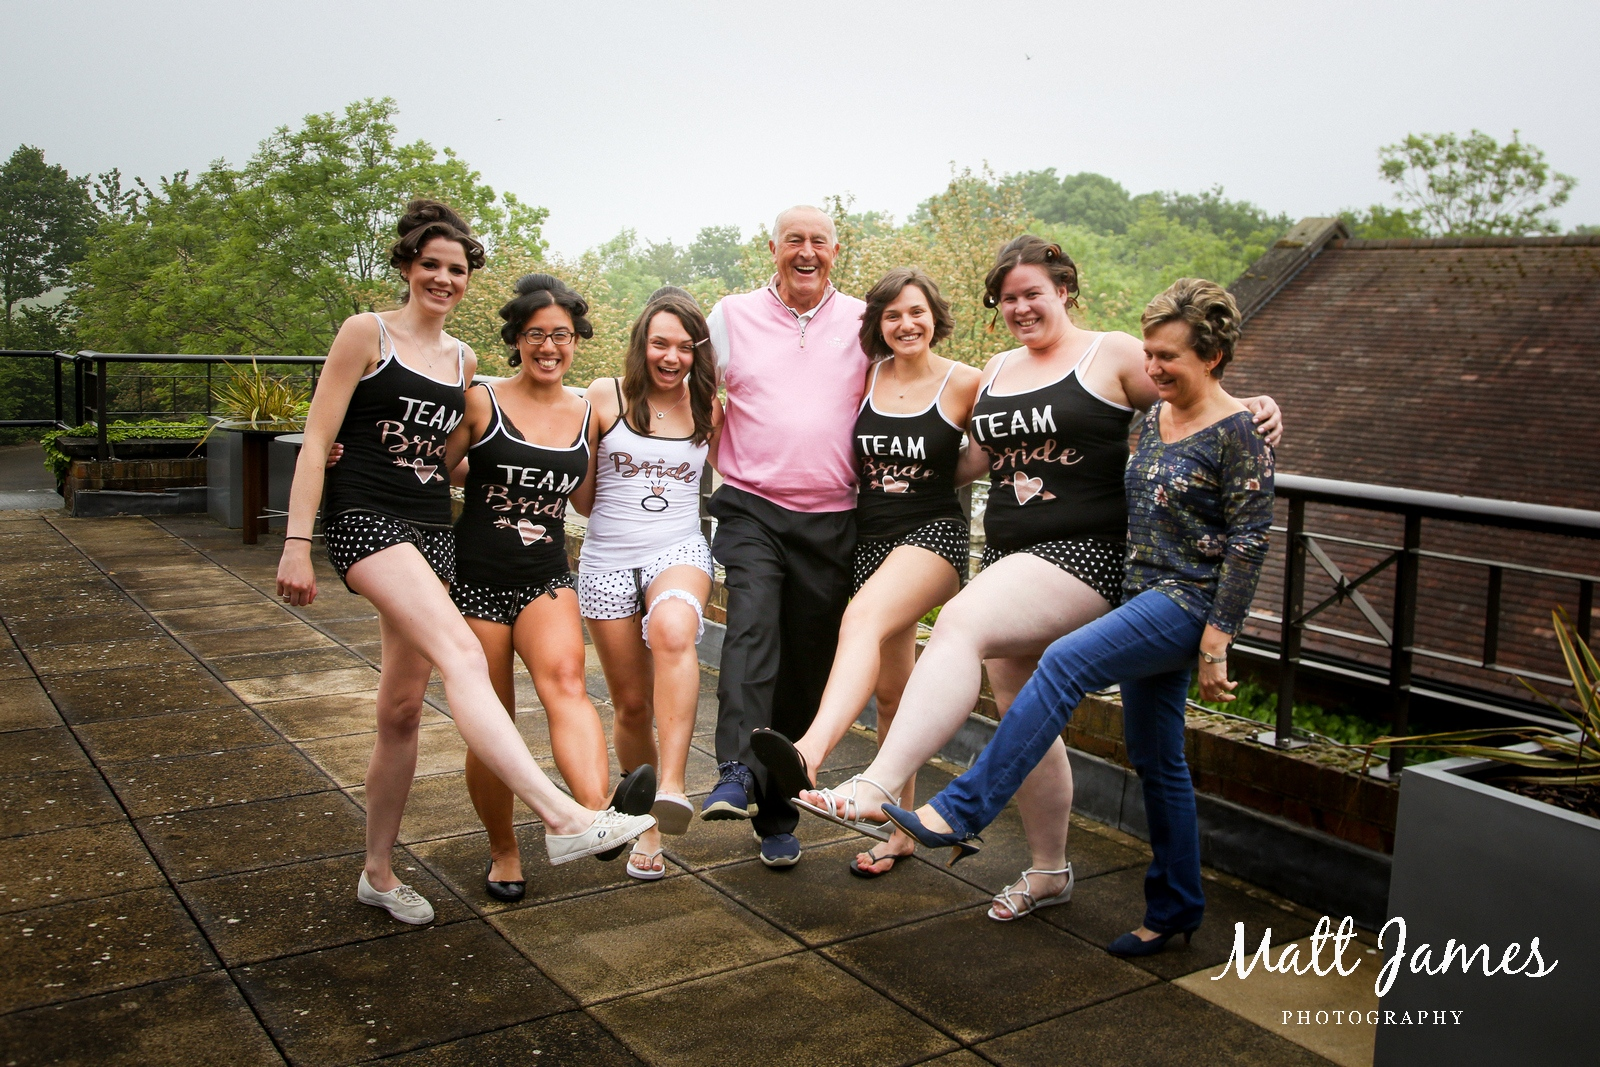 Victoria-and-Len-Goodman-London-Golf-Club-Wedding1